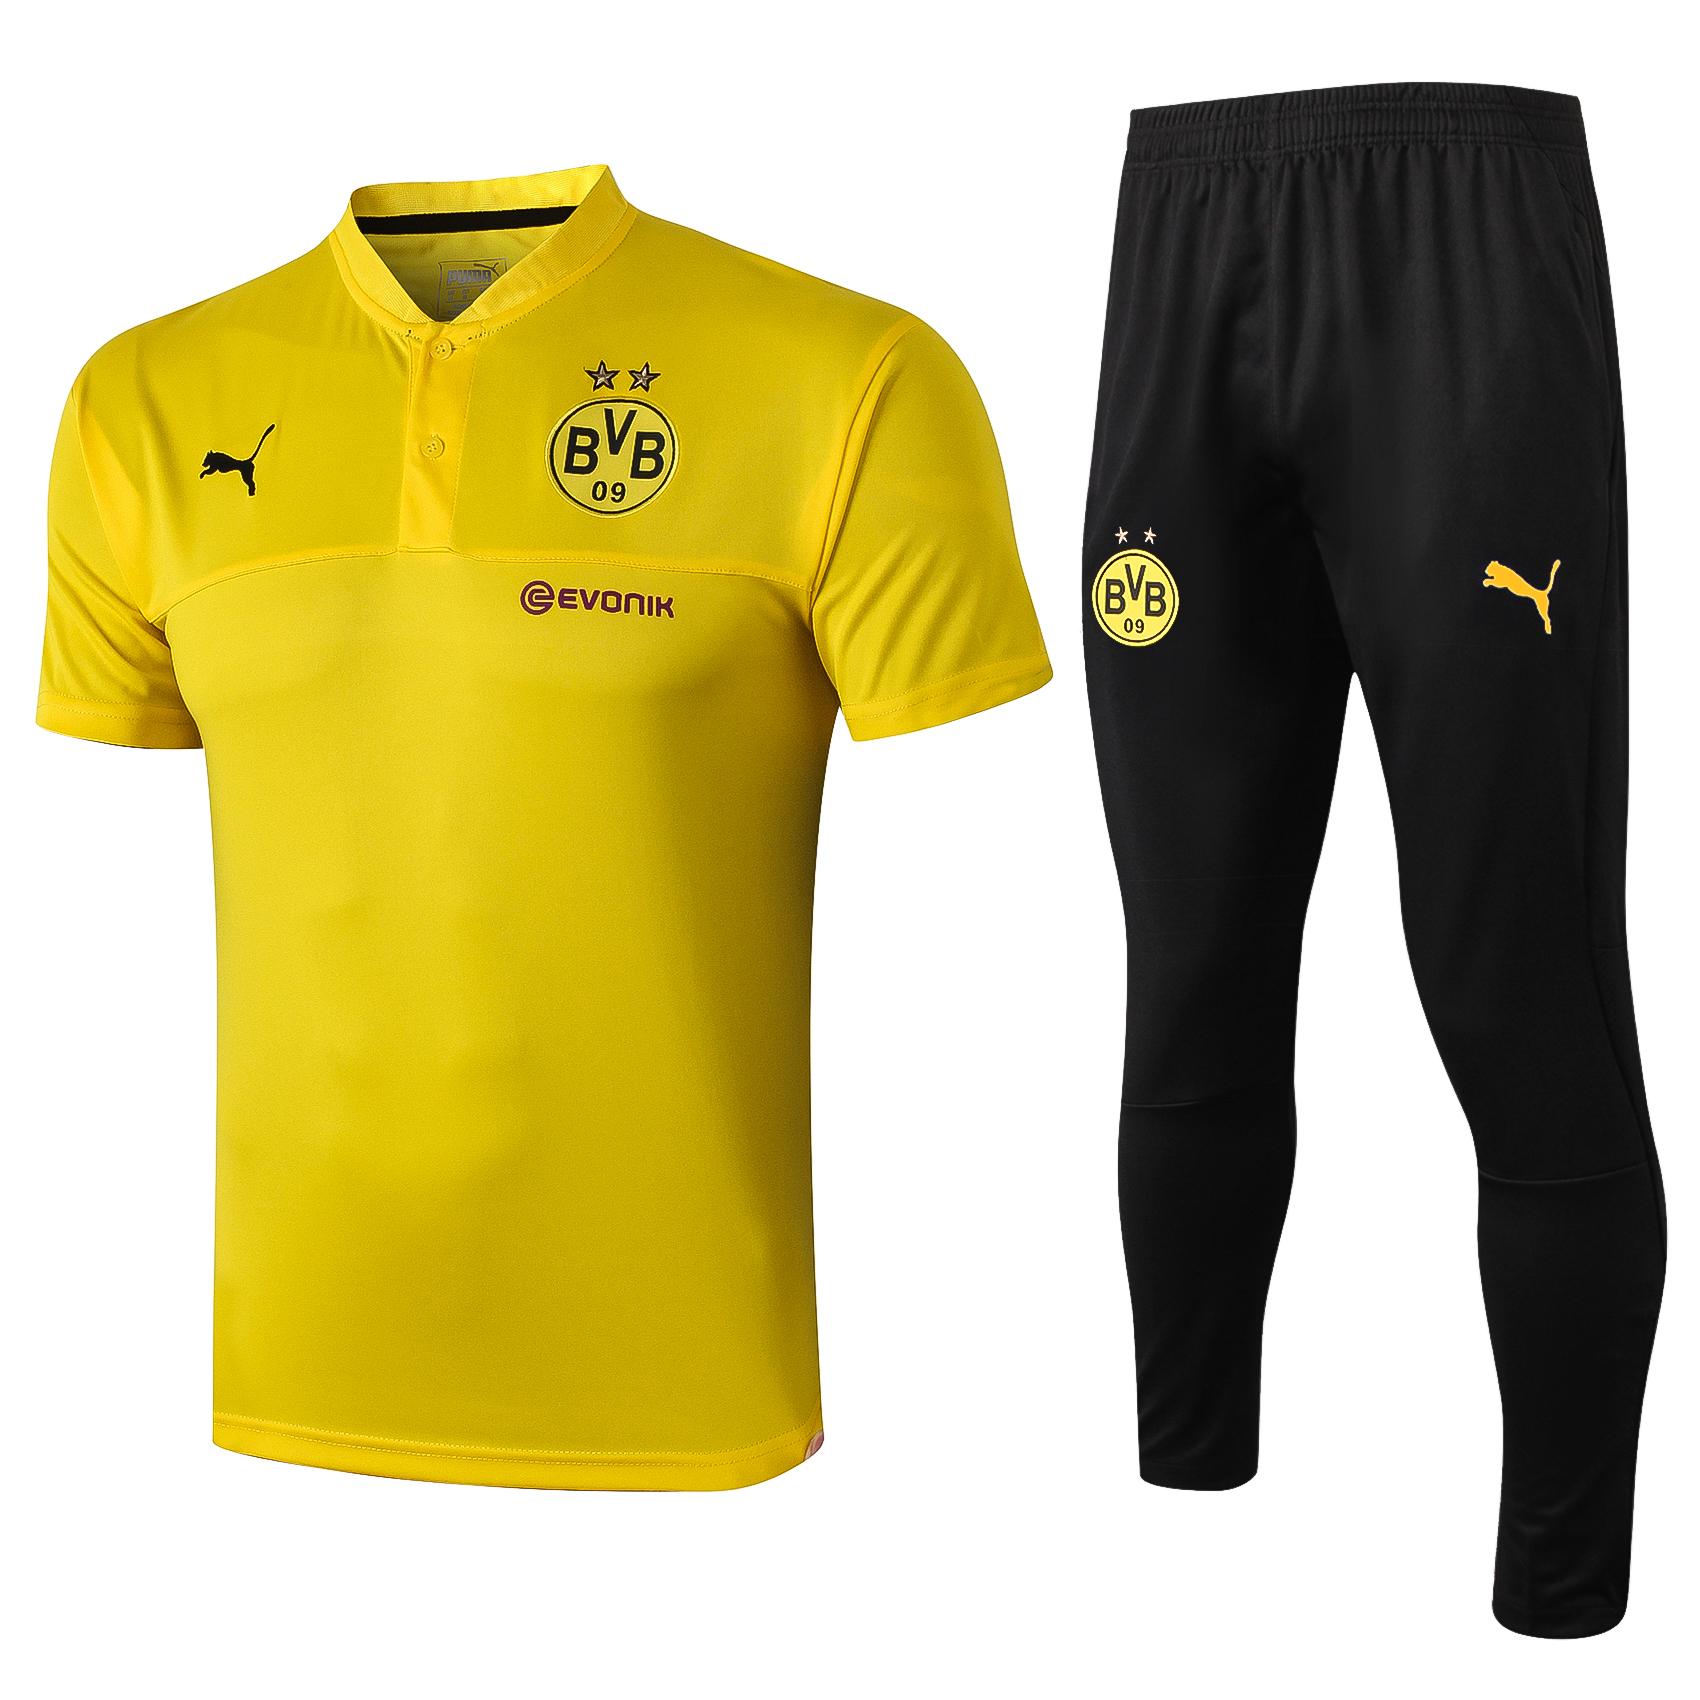 Bvb Borussia Dortmund Adult Yellow Pre Match Shirt 2019 20